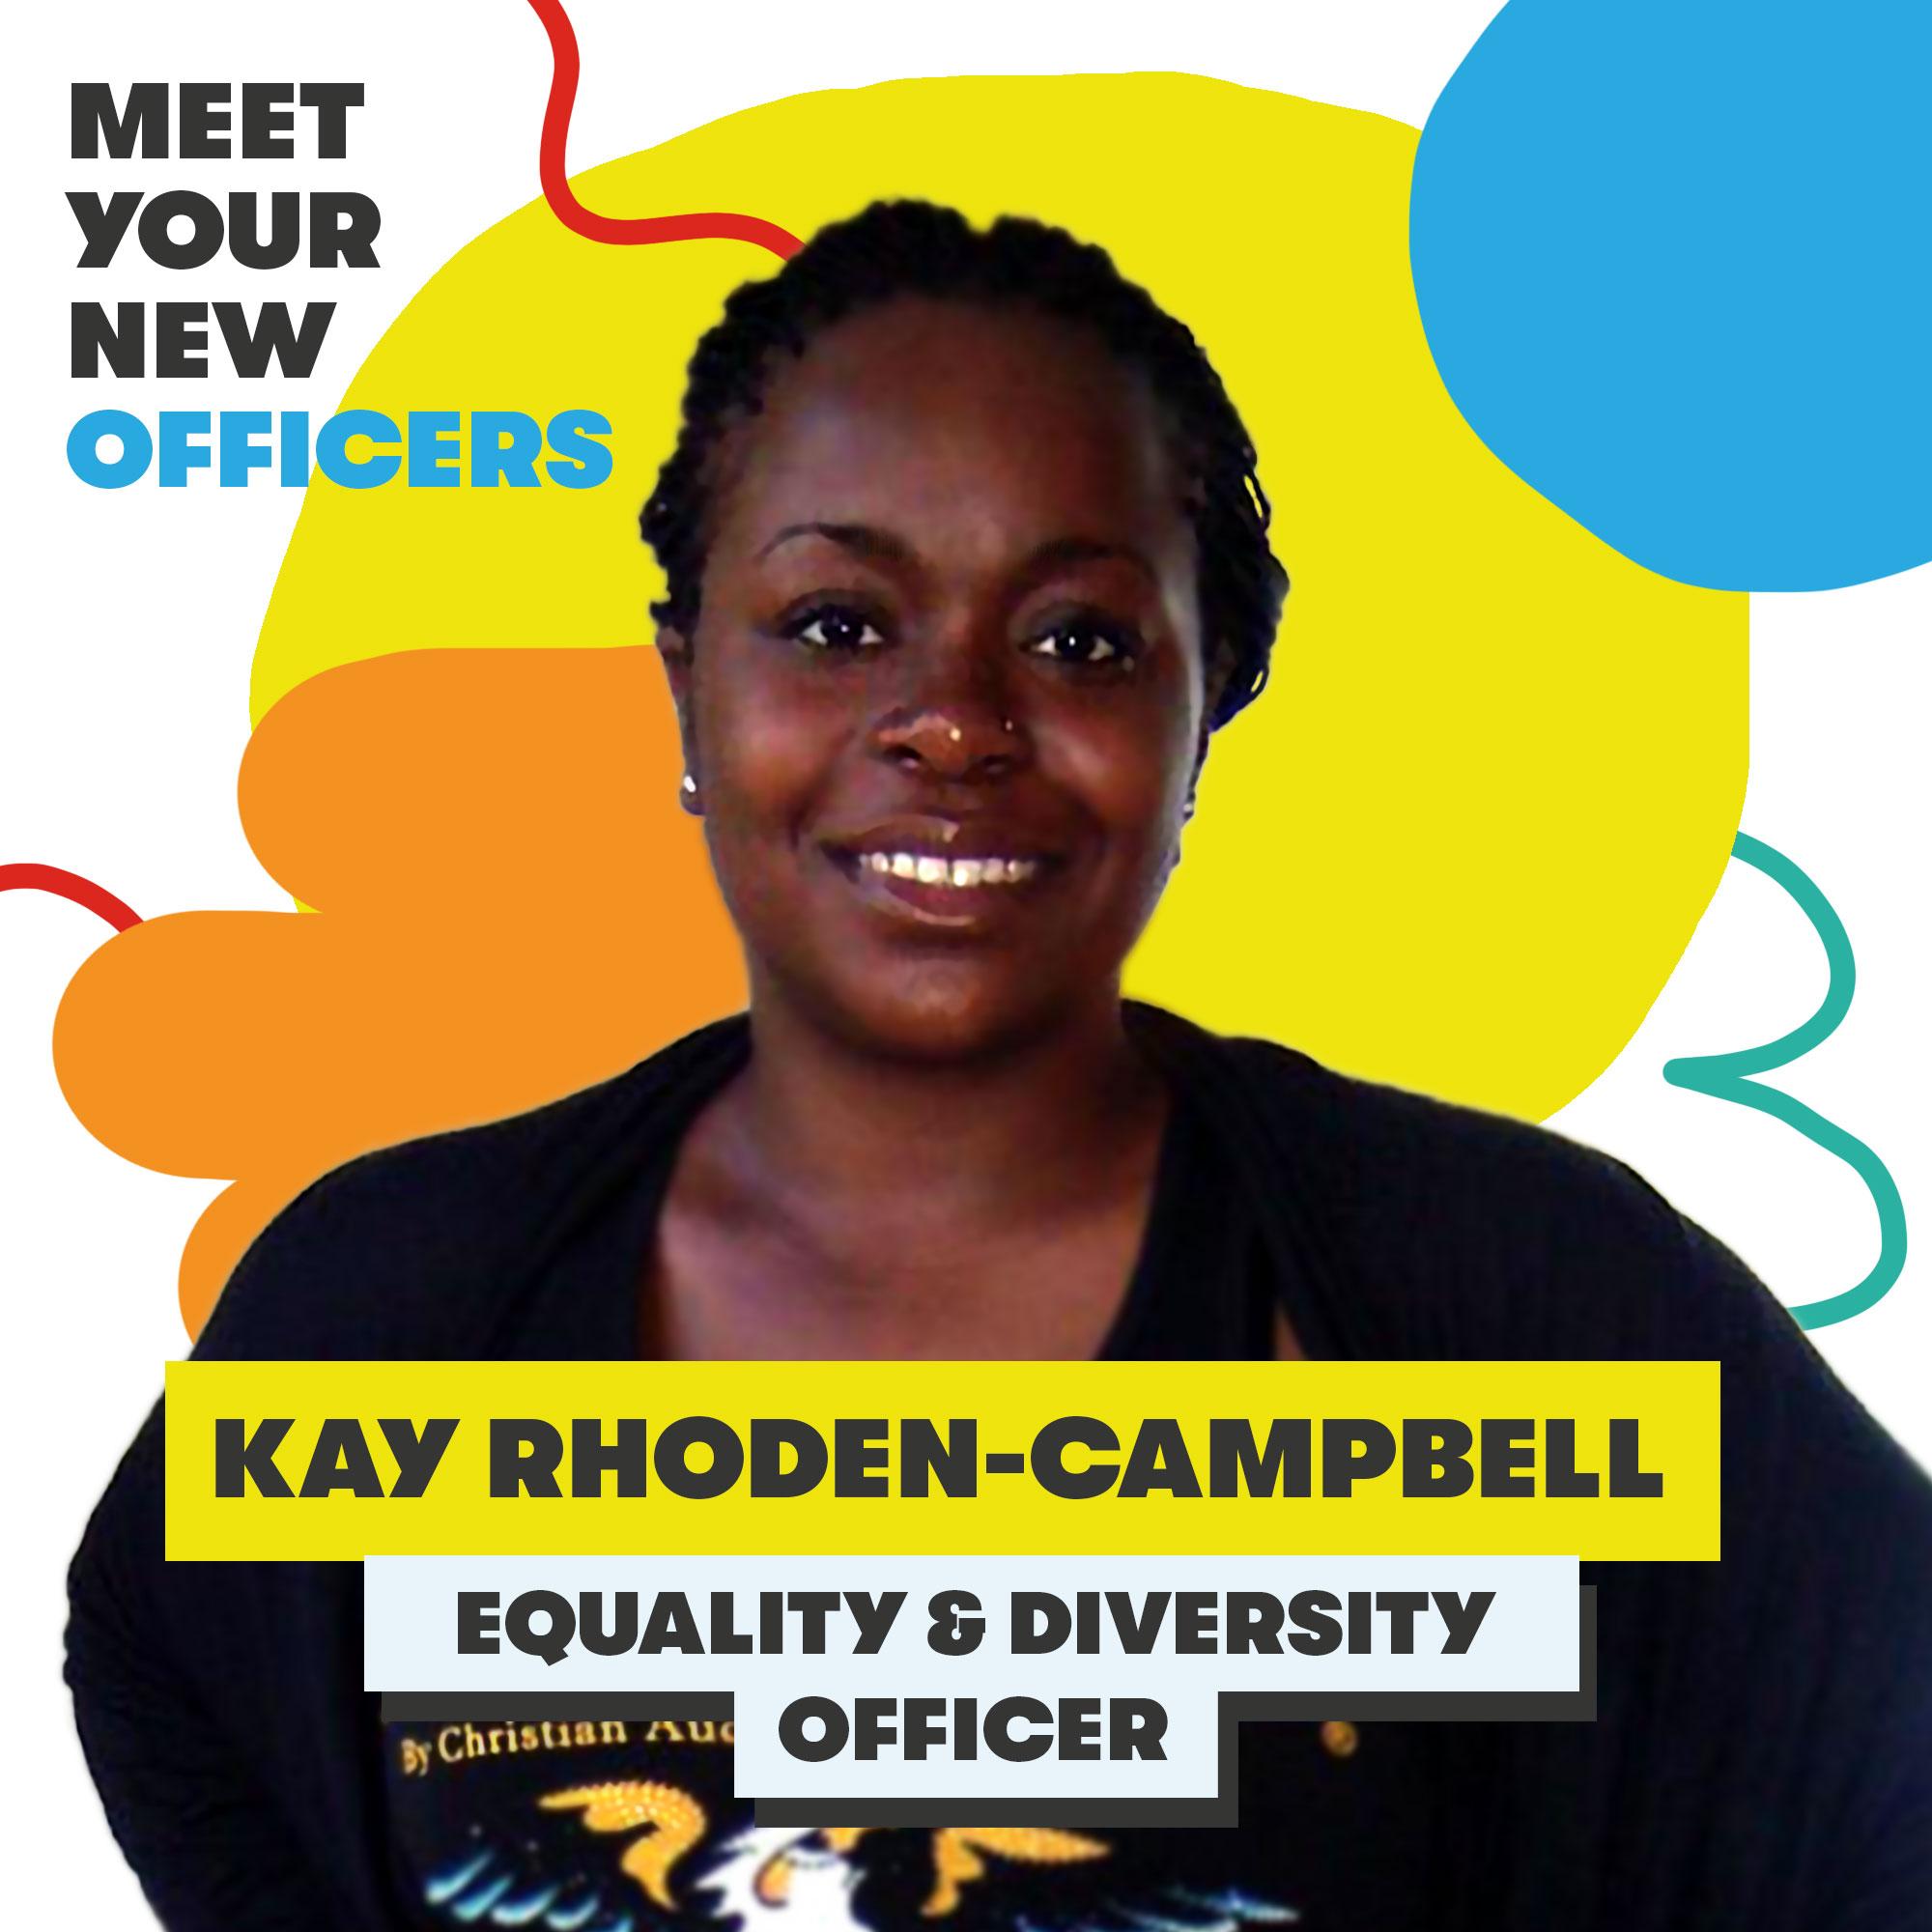 Kay Rhoden-Campbell